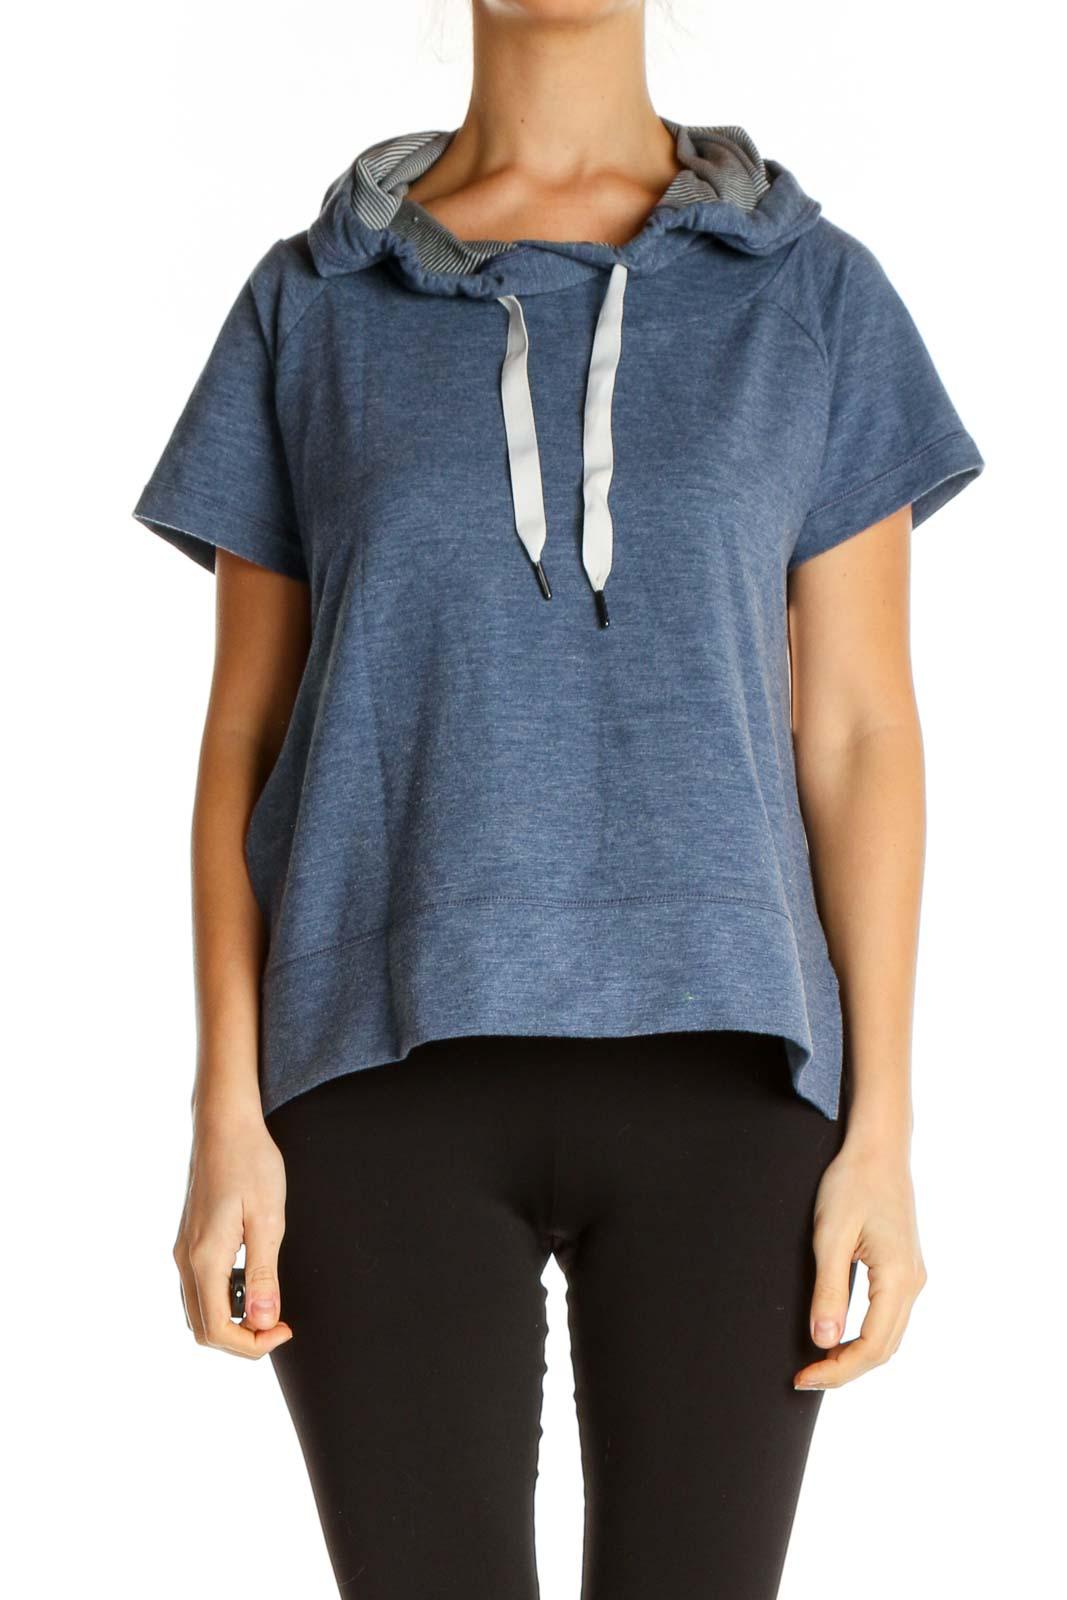 Blue Sweatshirt Front